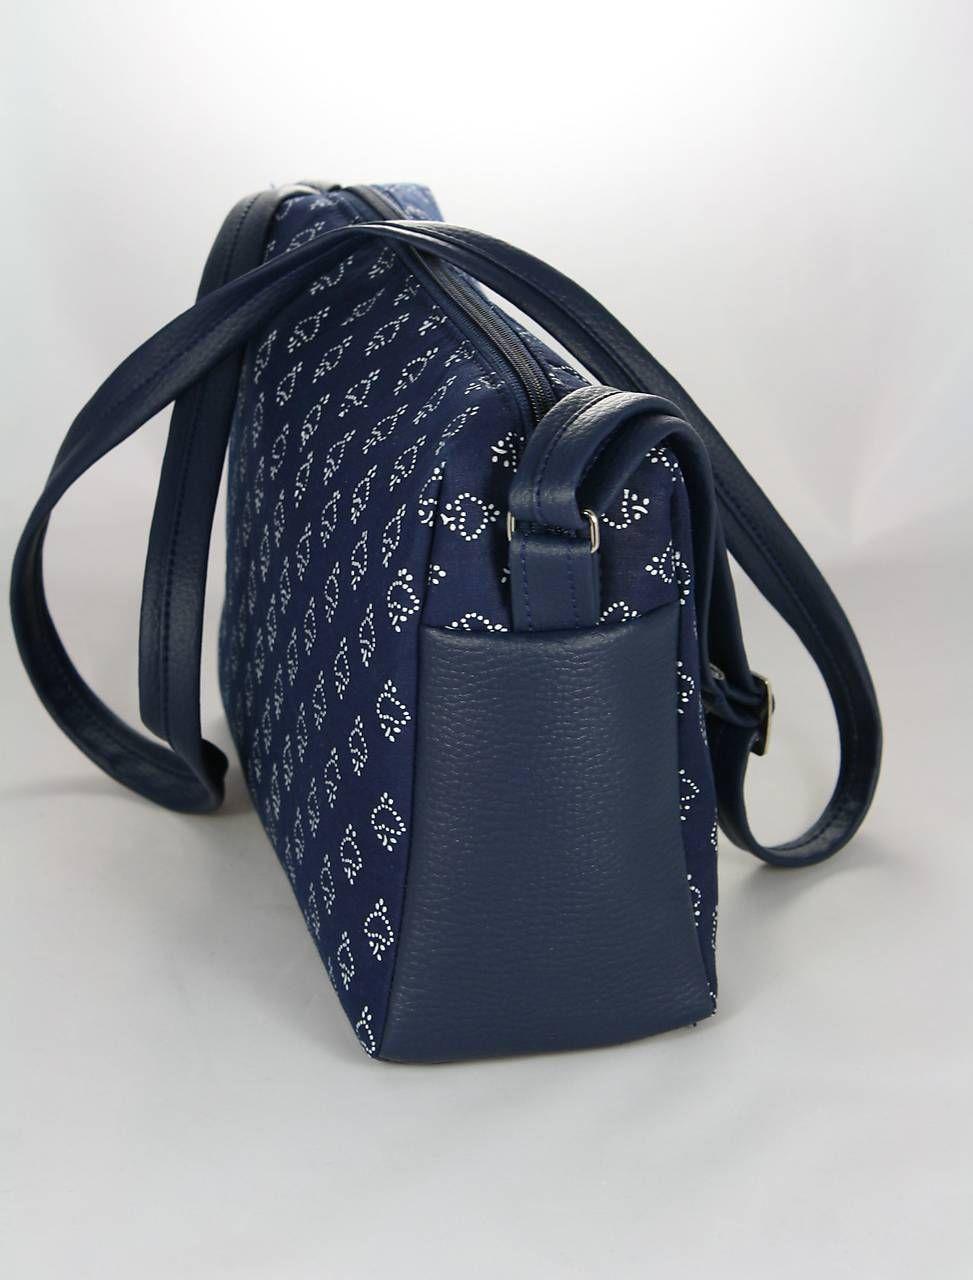 c59fd742600f Kabelky - Rebeka modrá + modrotlač 5